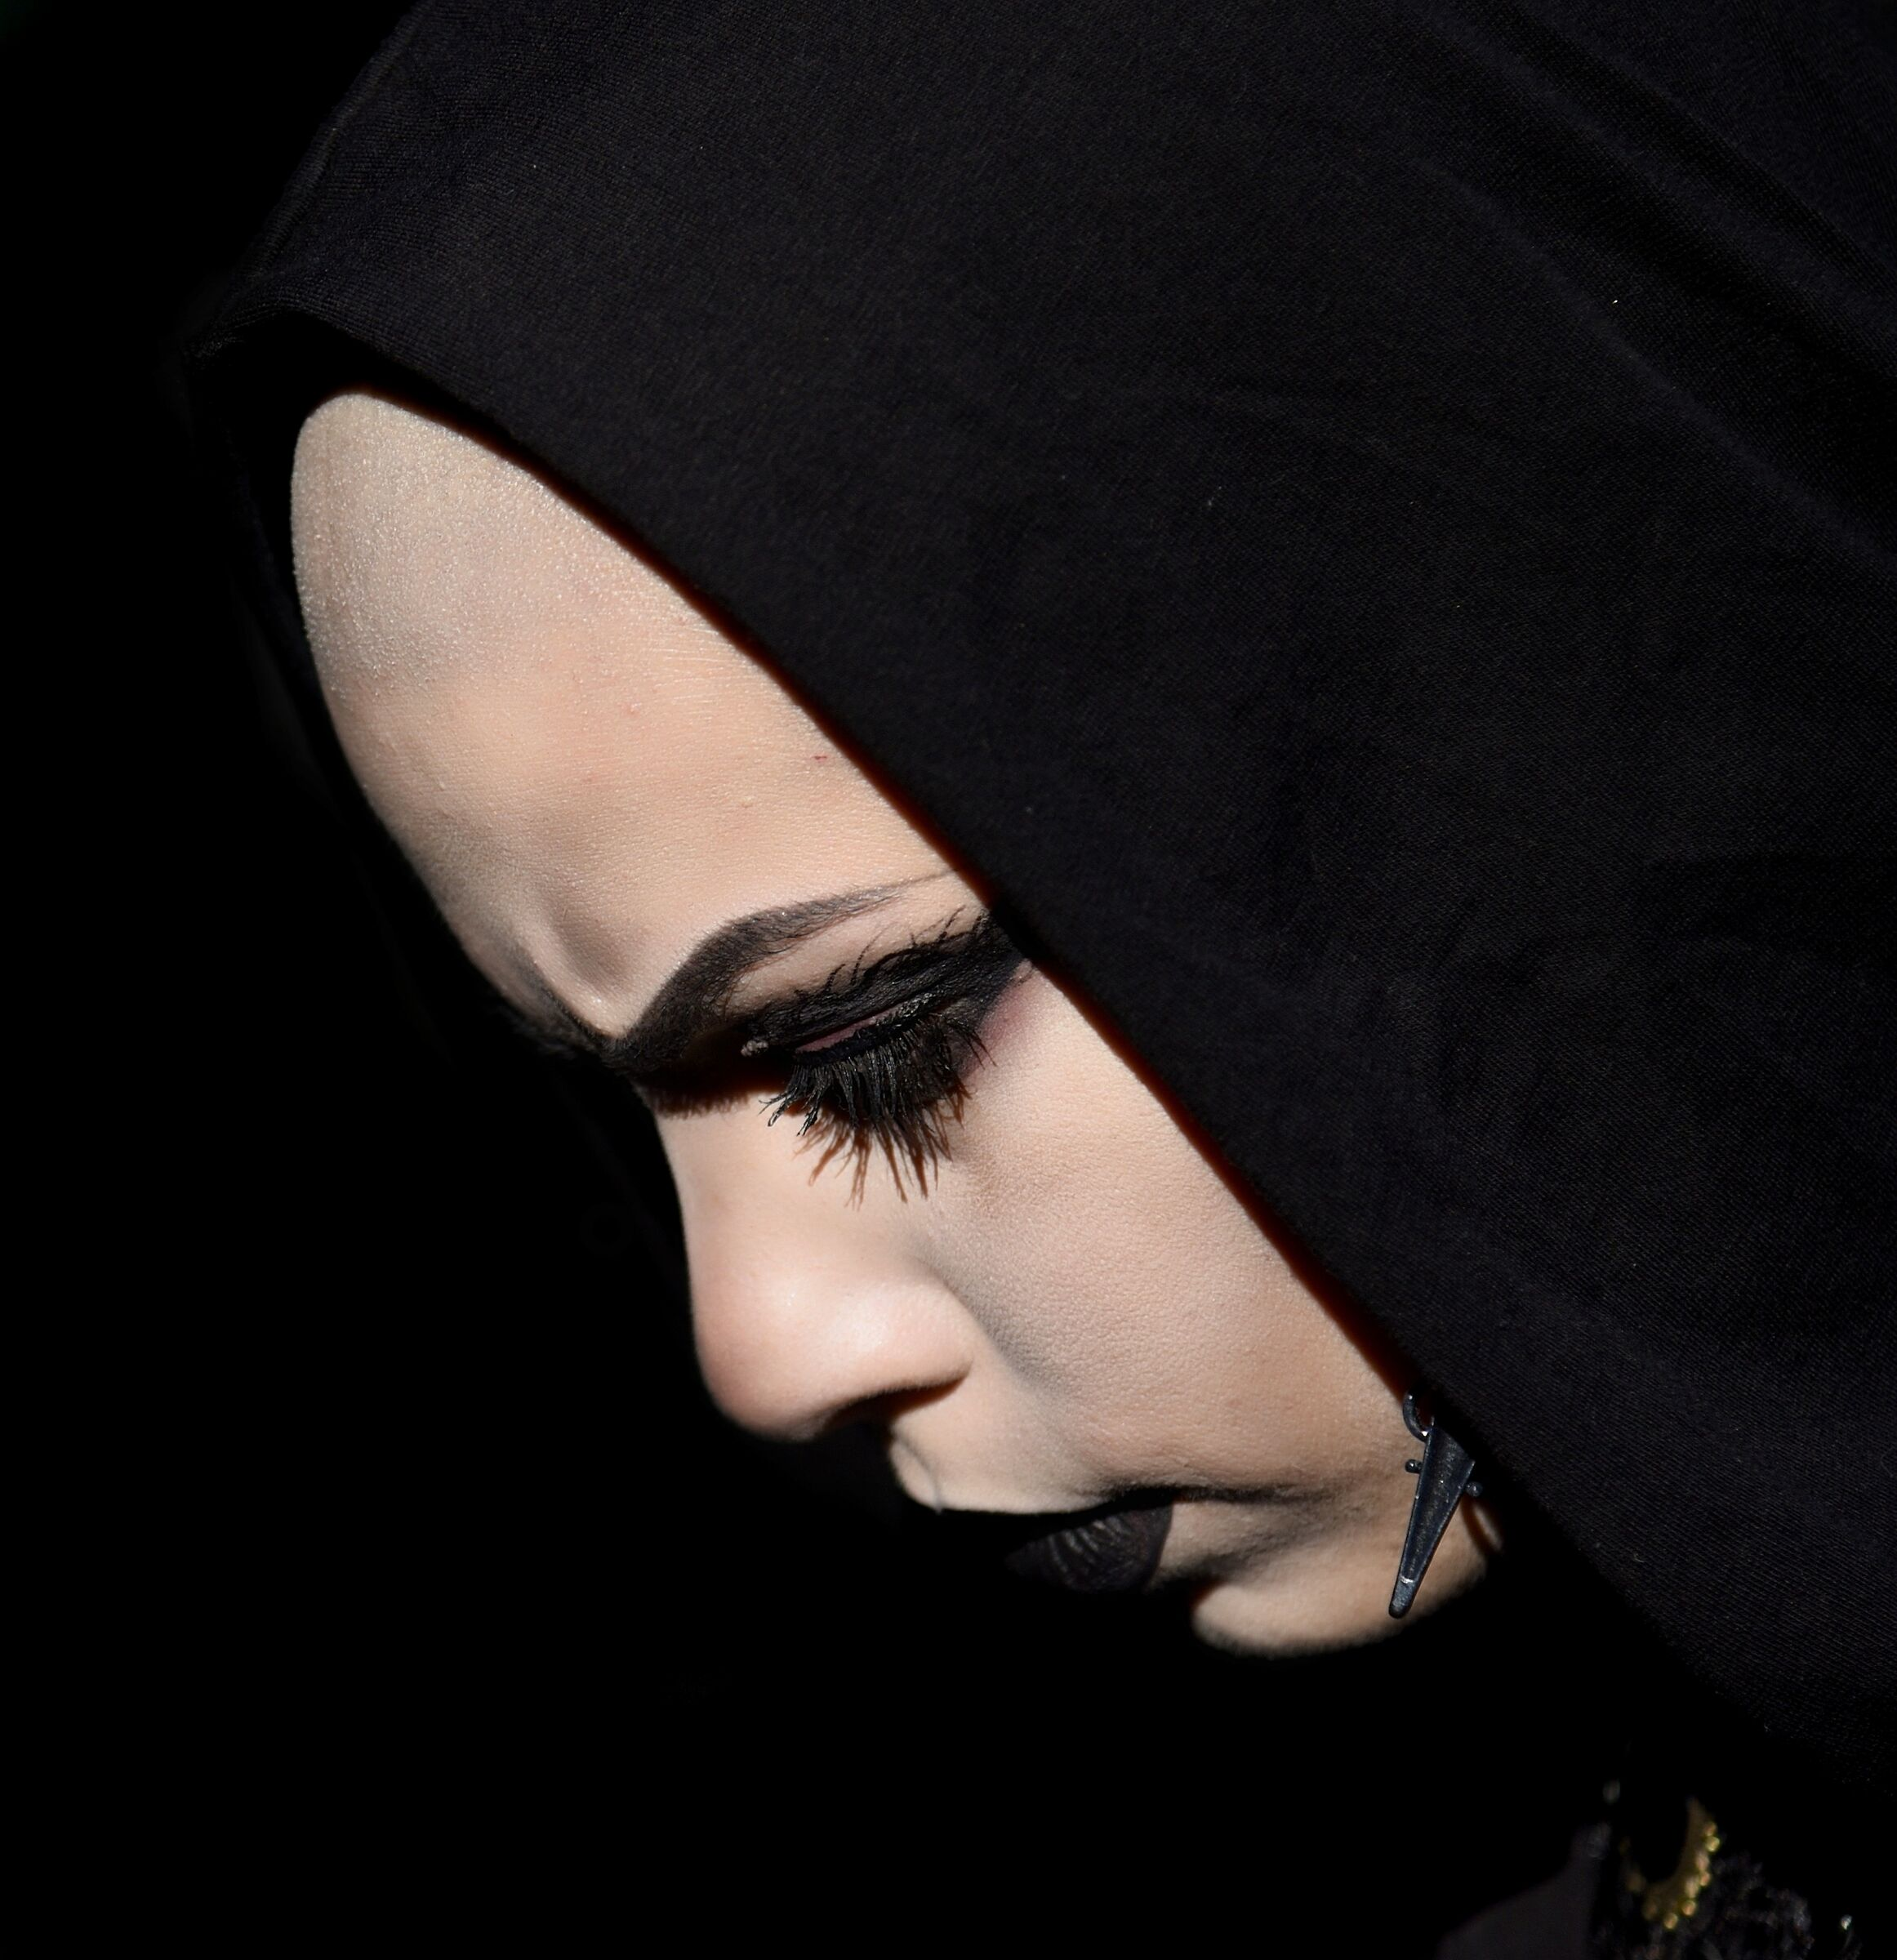 The Dark Lady ...